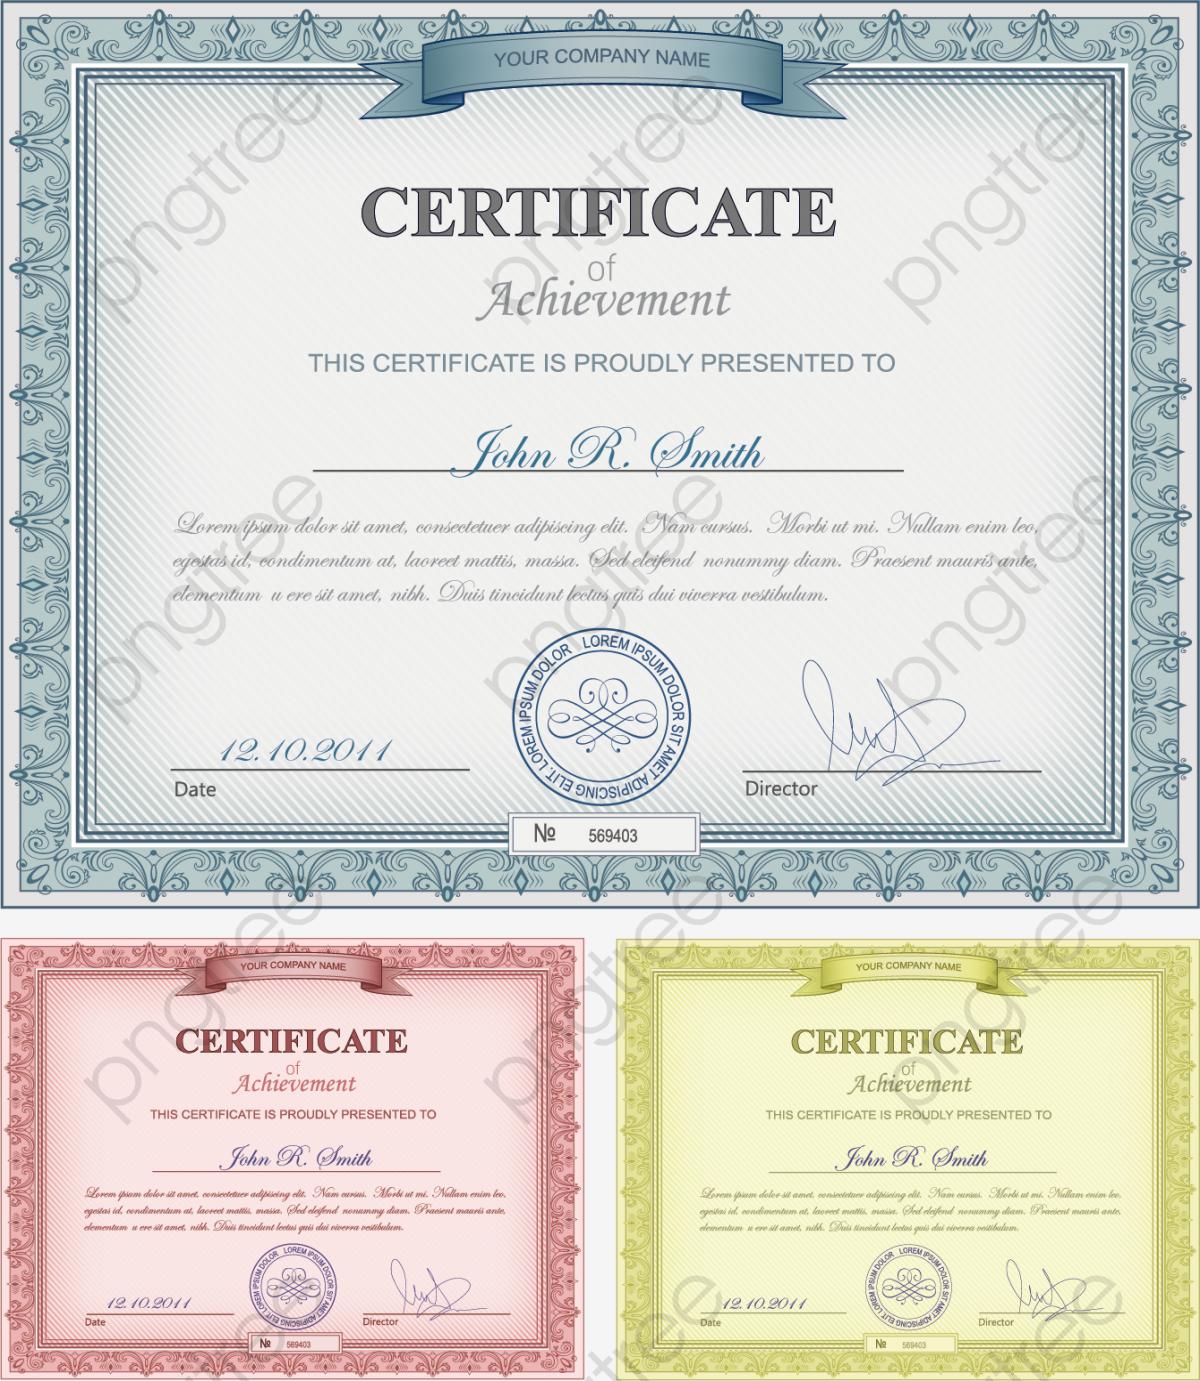 Transparent European Certificate Template PNG Format Image